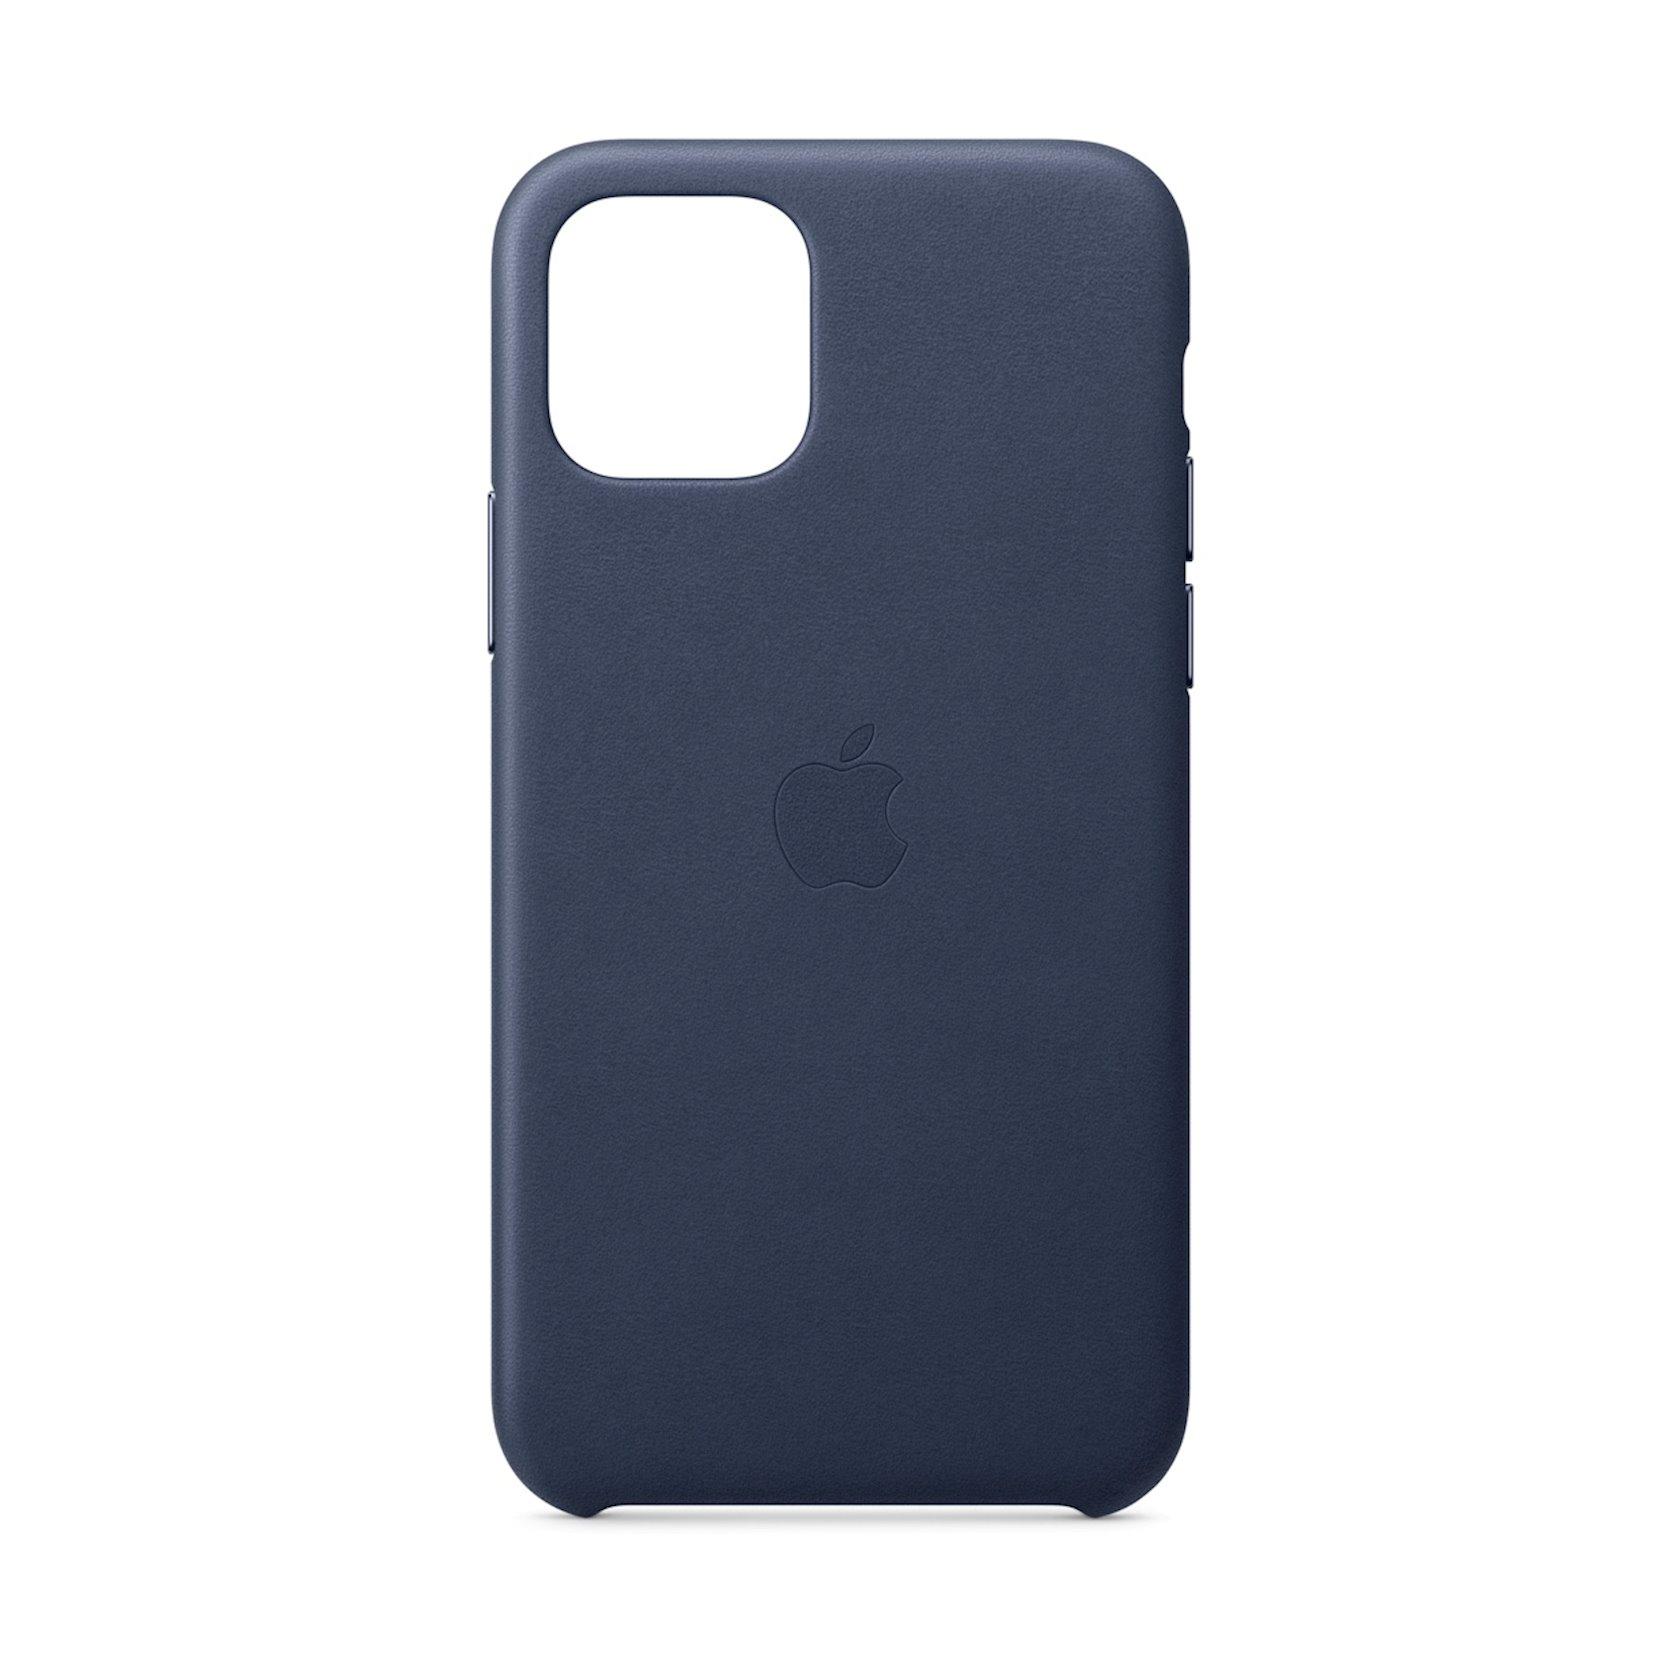 Çexol Leather Case Apple iPhone 11 Pro üçün  Midnight Blue